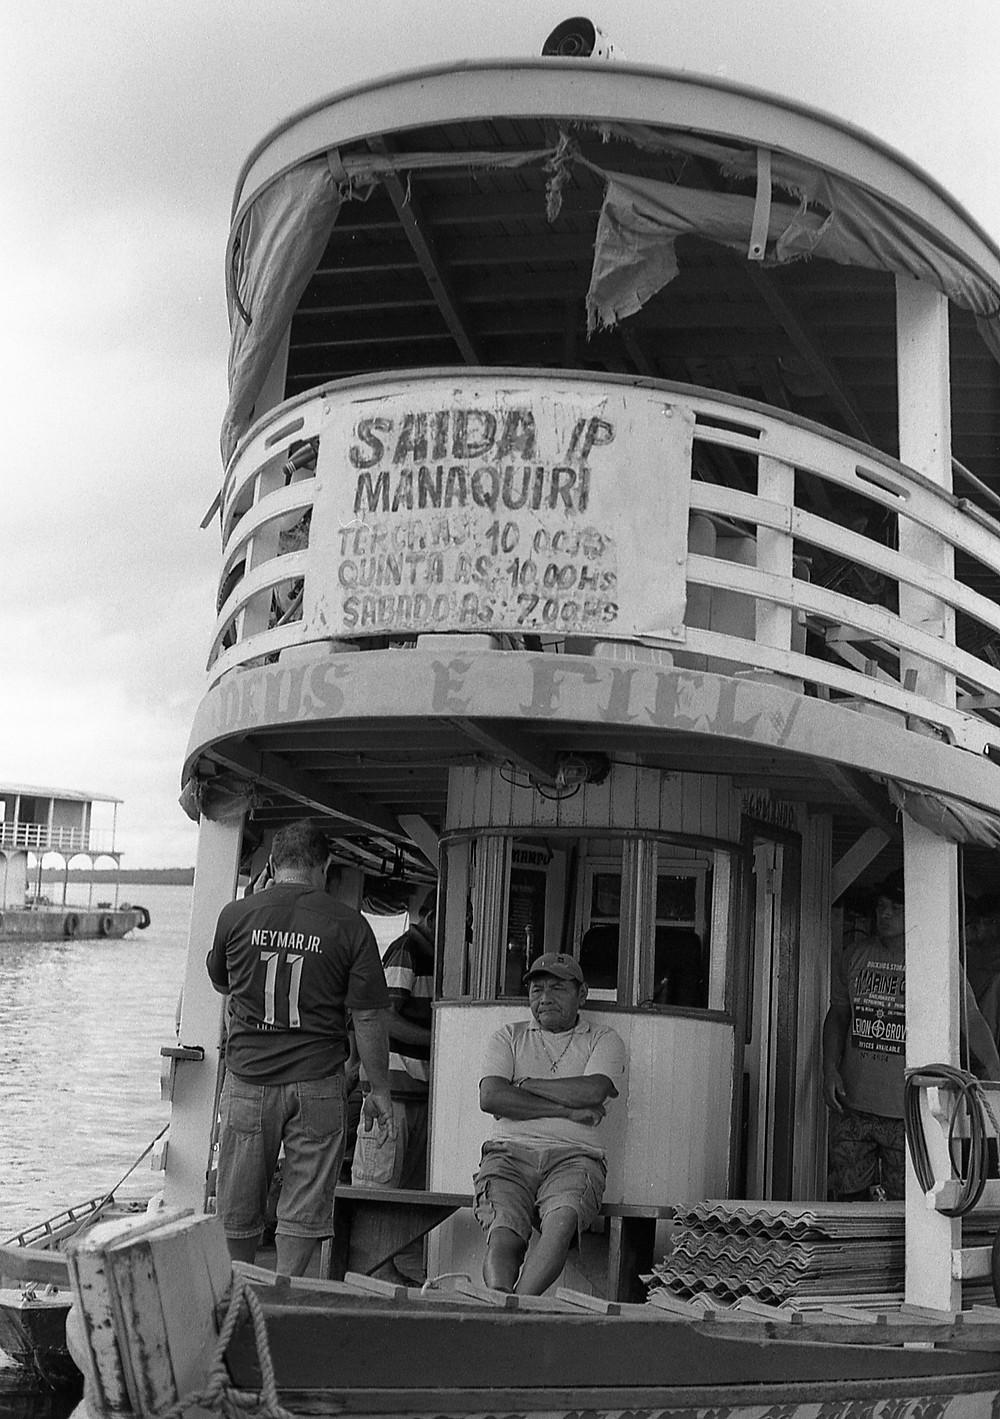 The wait. Porto de Manaus, Brasil